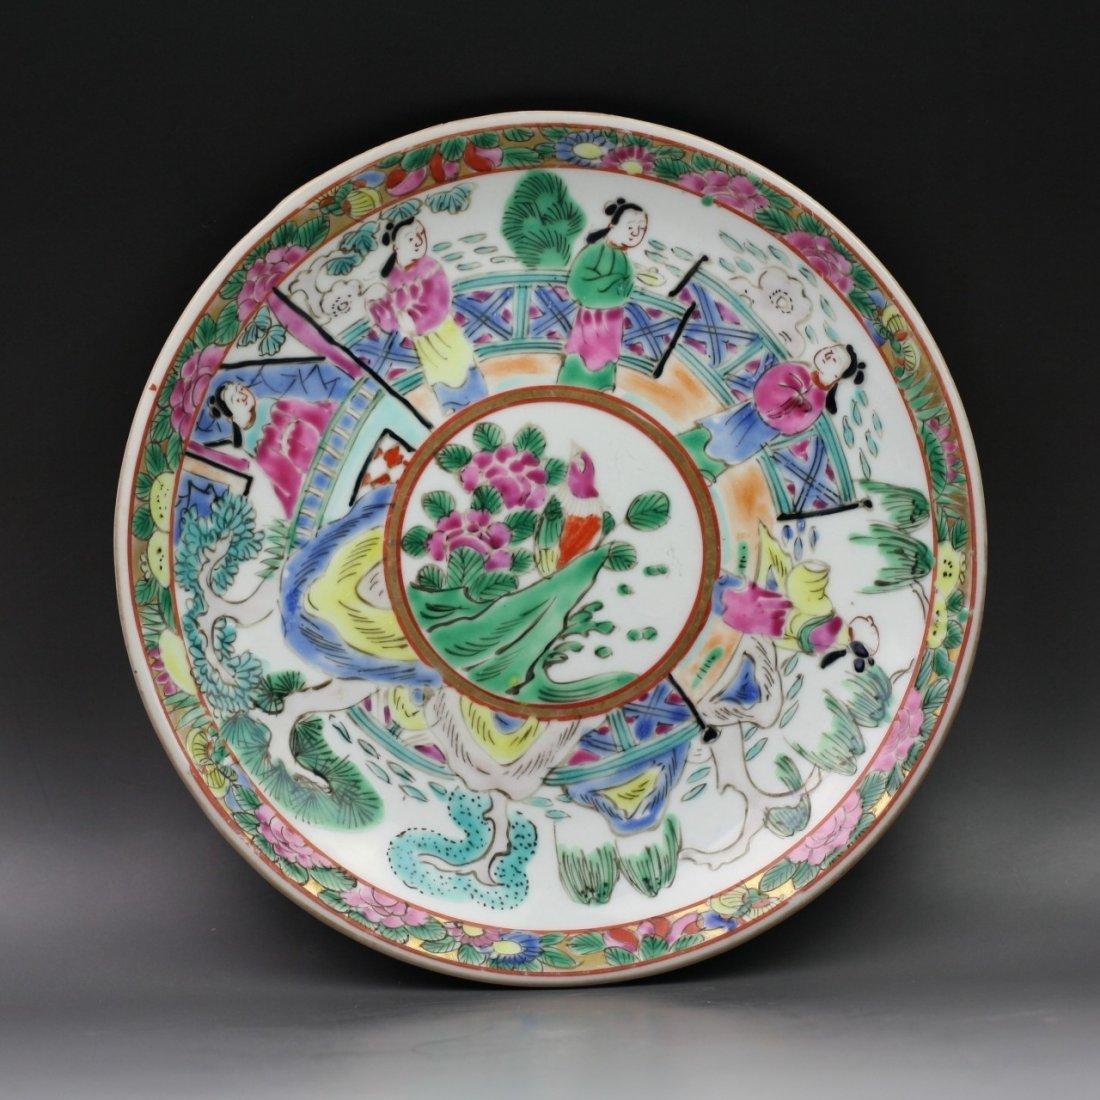 281: A Japanese Imari Polychrome Porcelain Plate